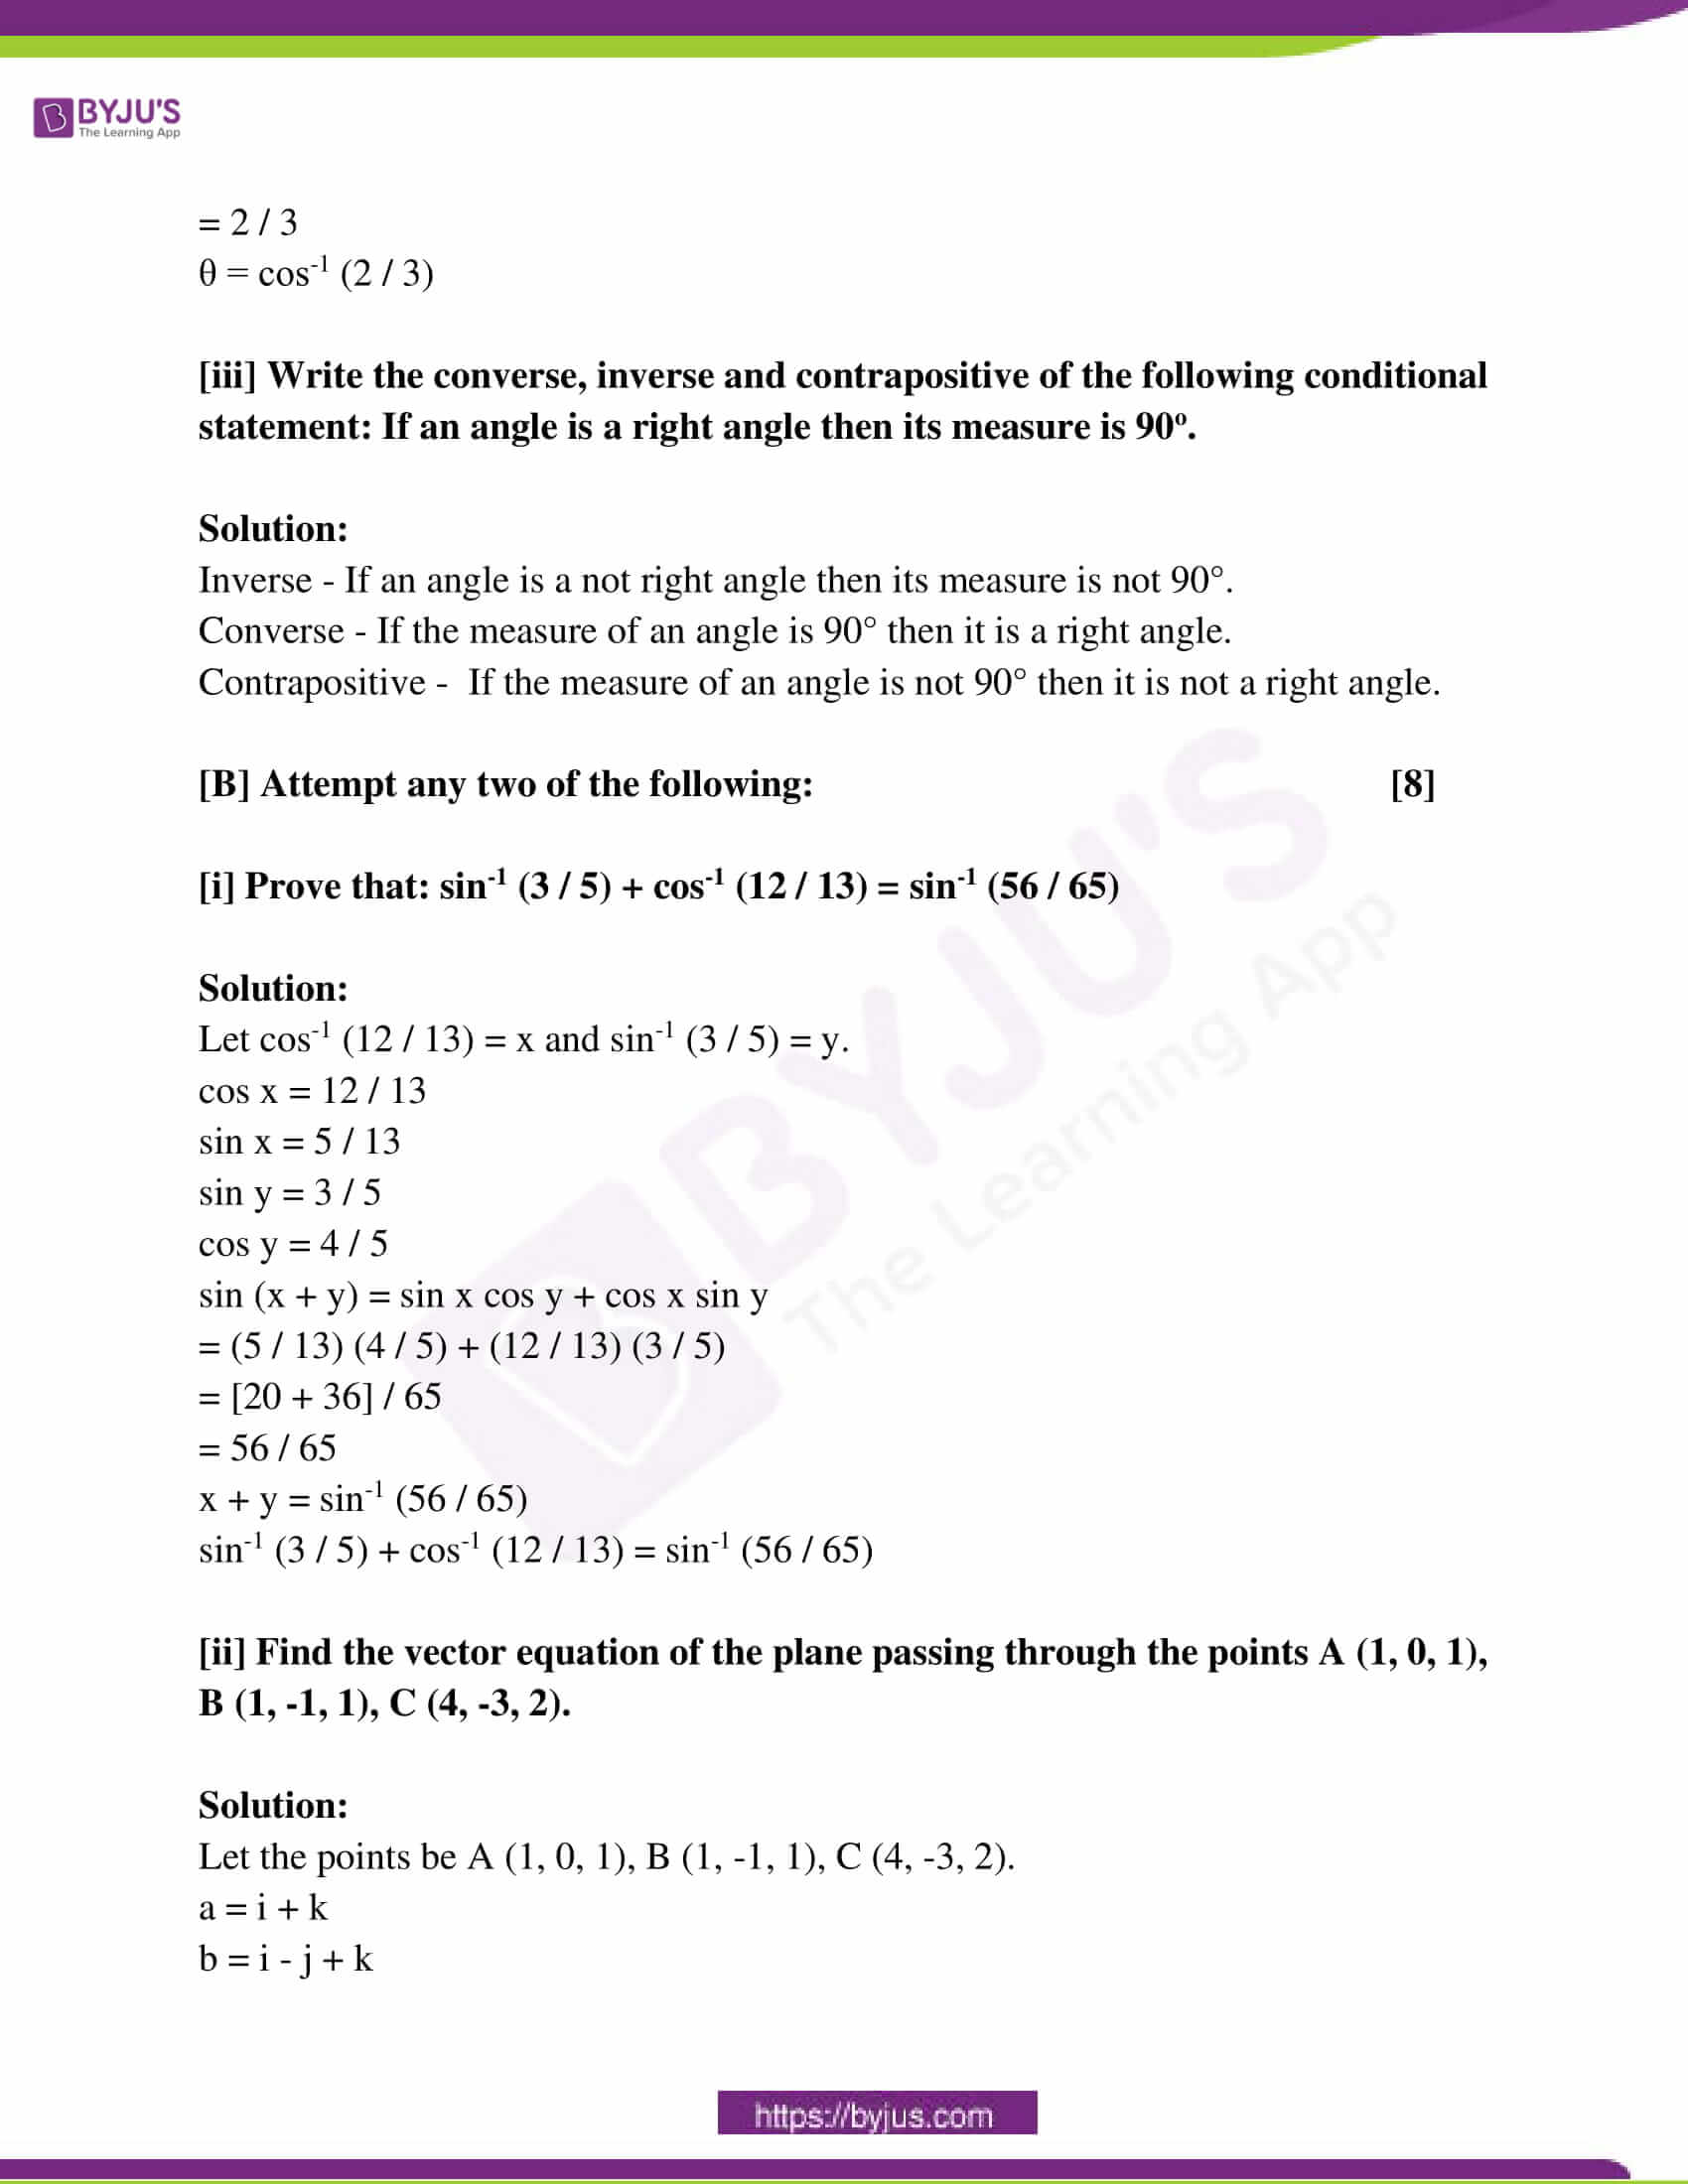 maharashtra class 12 exam question paper solutions march 2018 12